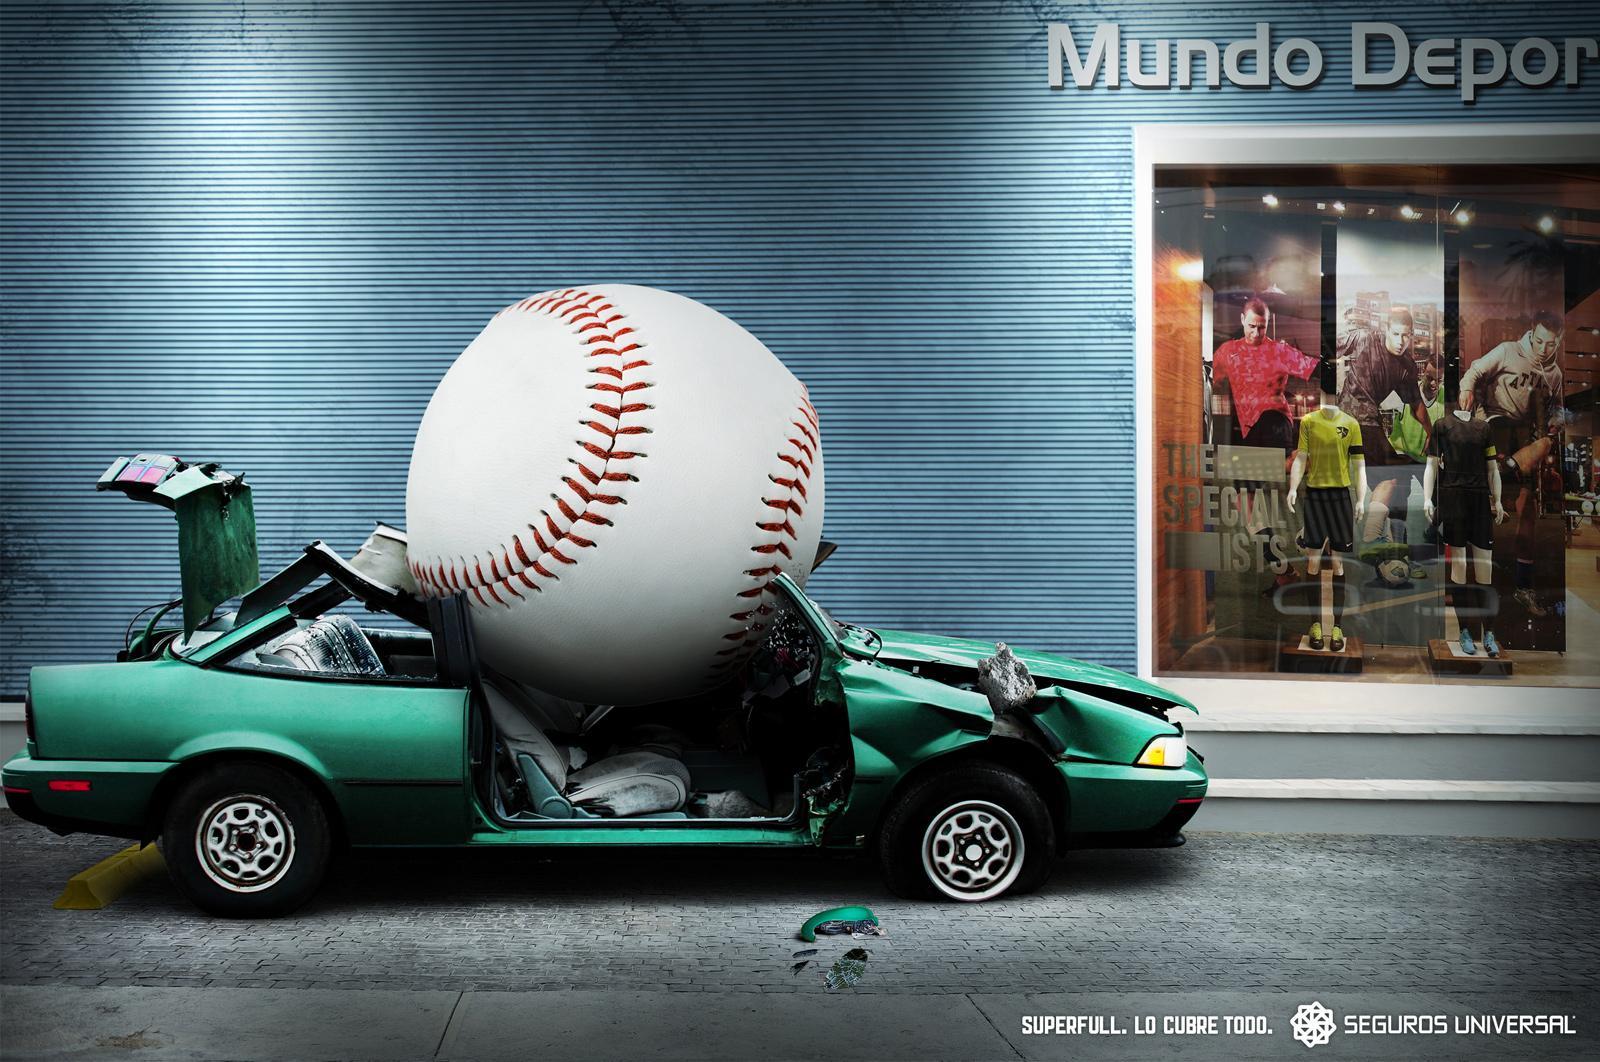 Universal Seguros Print Ad -  Ball